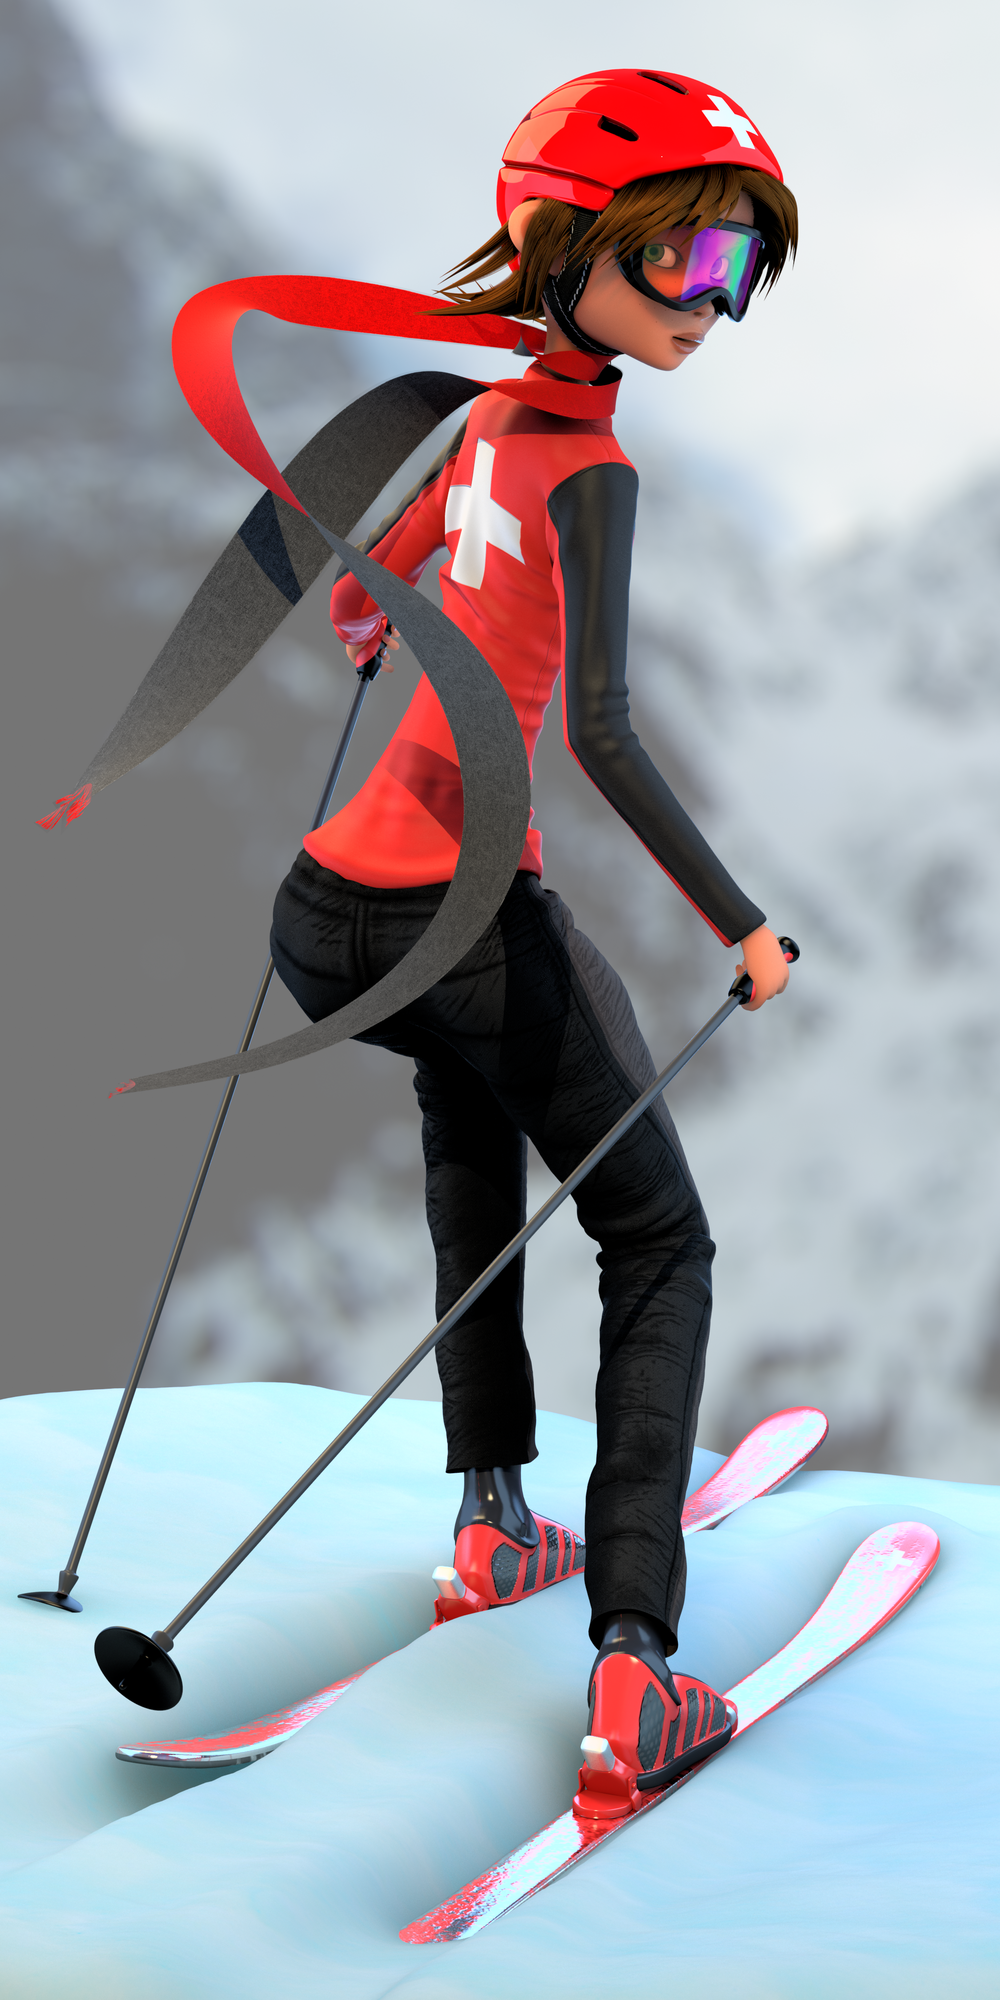 Ski Patrol Character